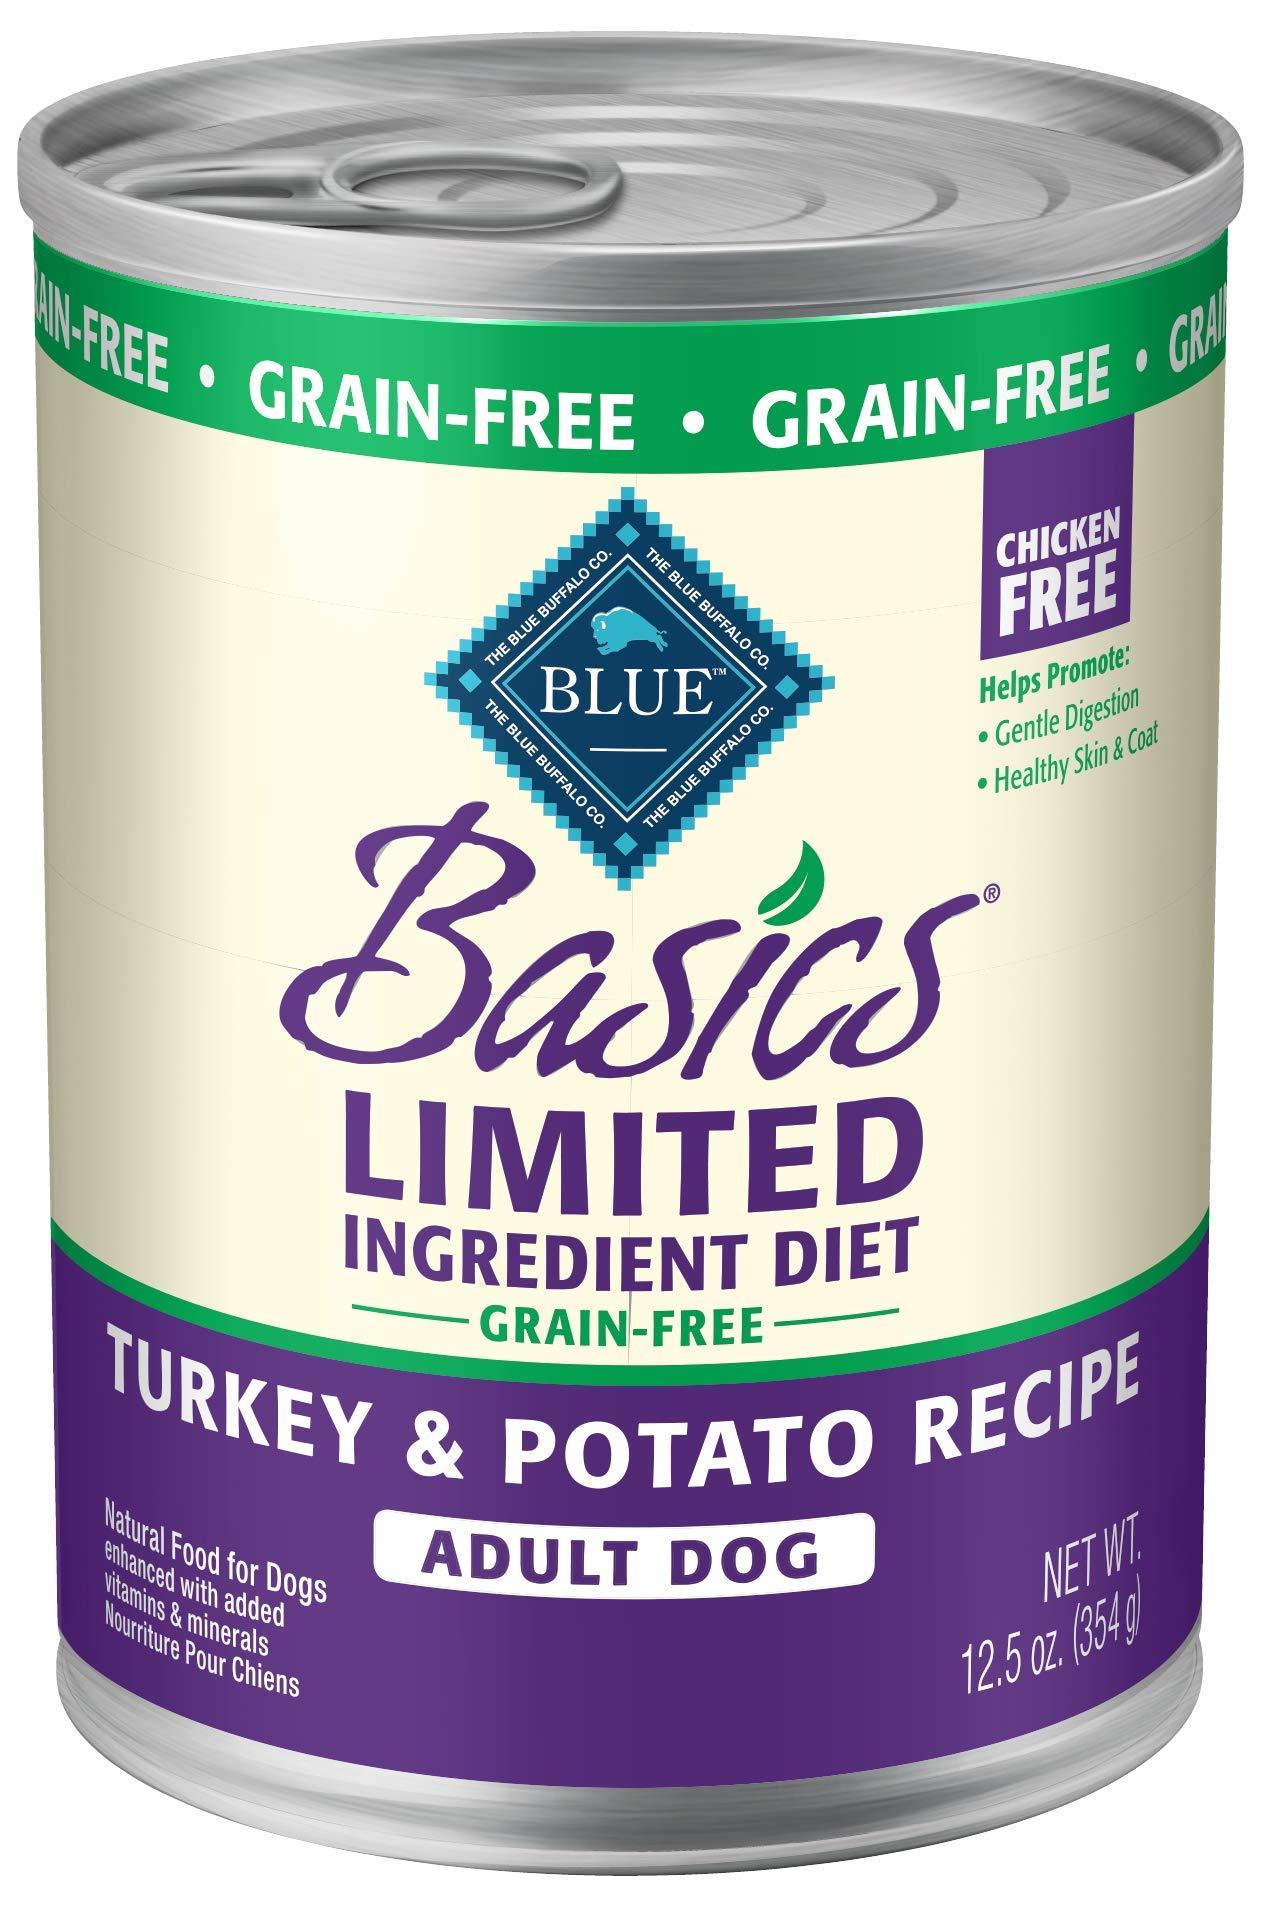 BLUE Basics Limited Ingredient Diet Adult Grain-Free Turkey & Potato  Wet Dog Food 12.5-oz (Pack of 12) by Blue Buffalo